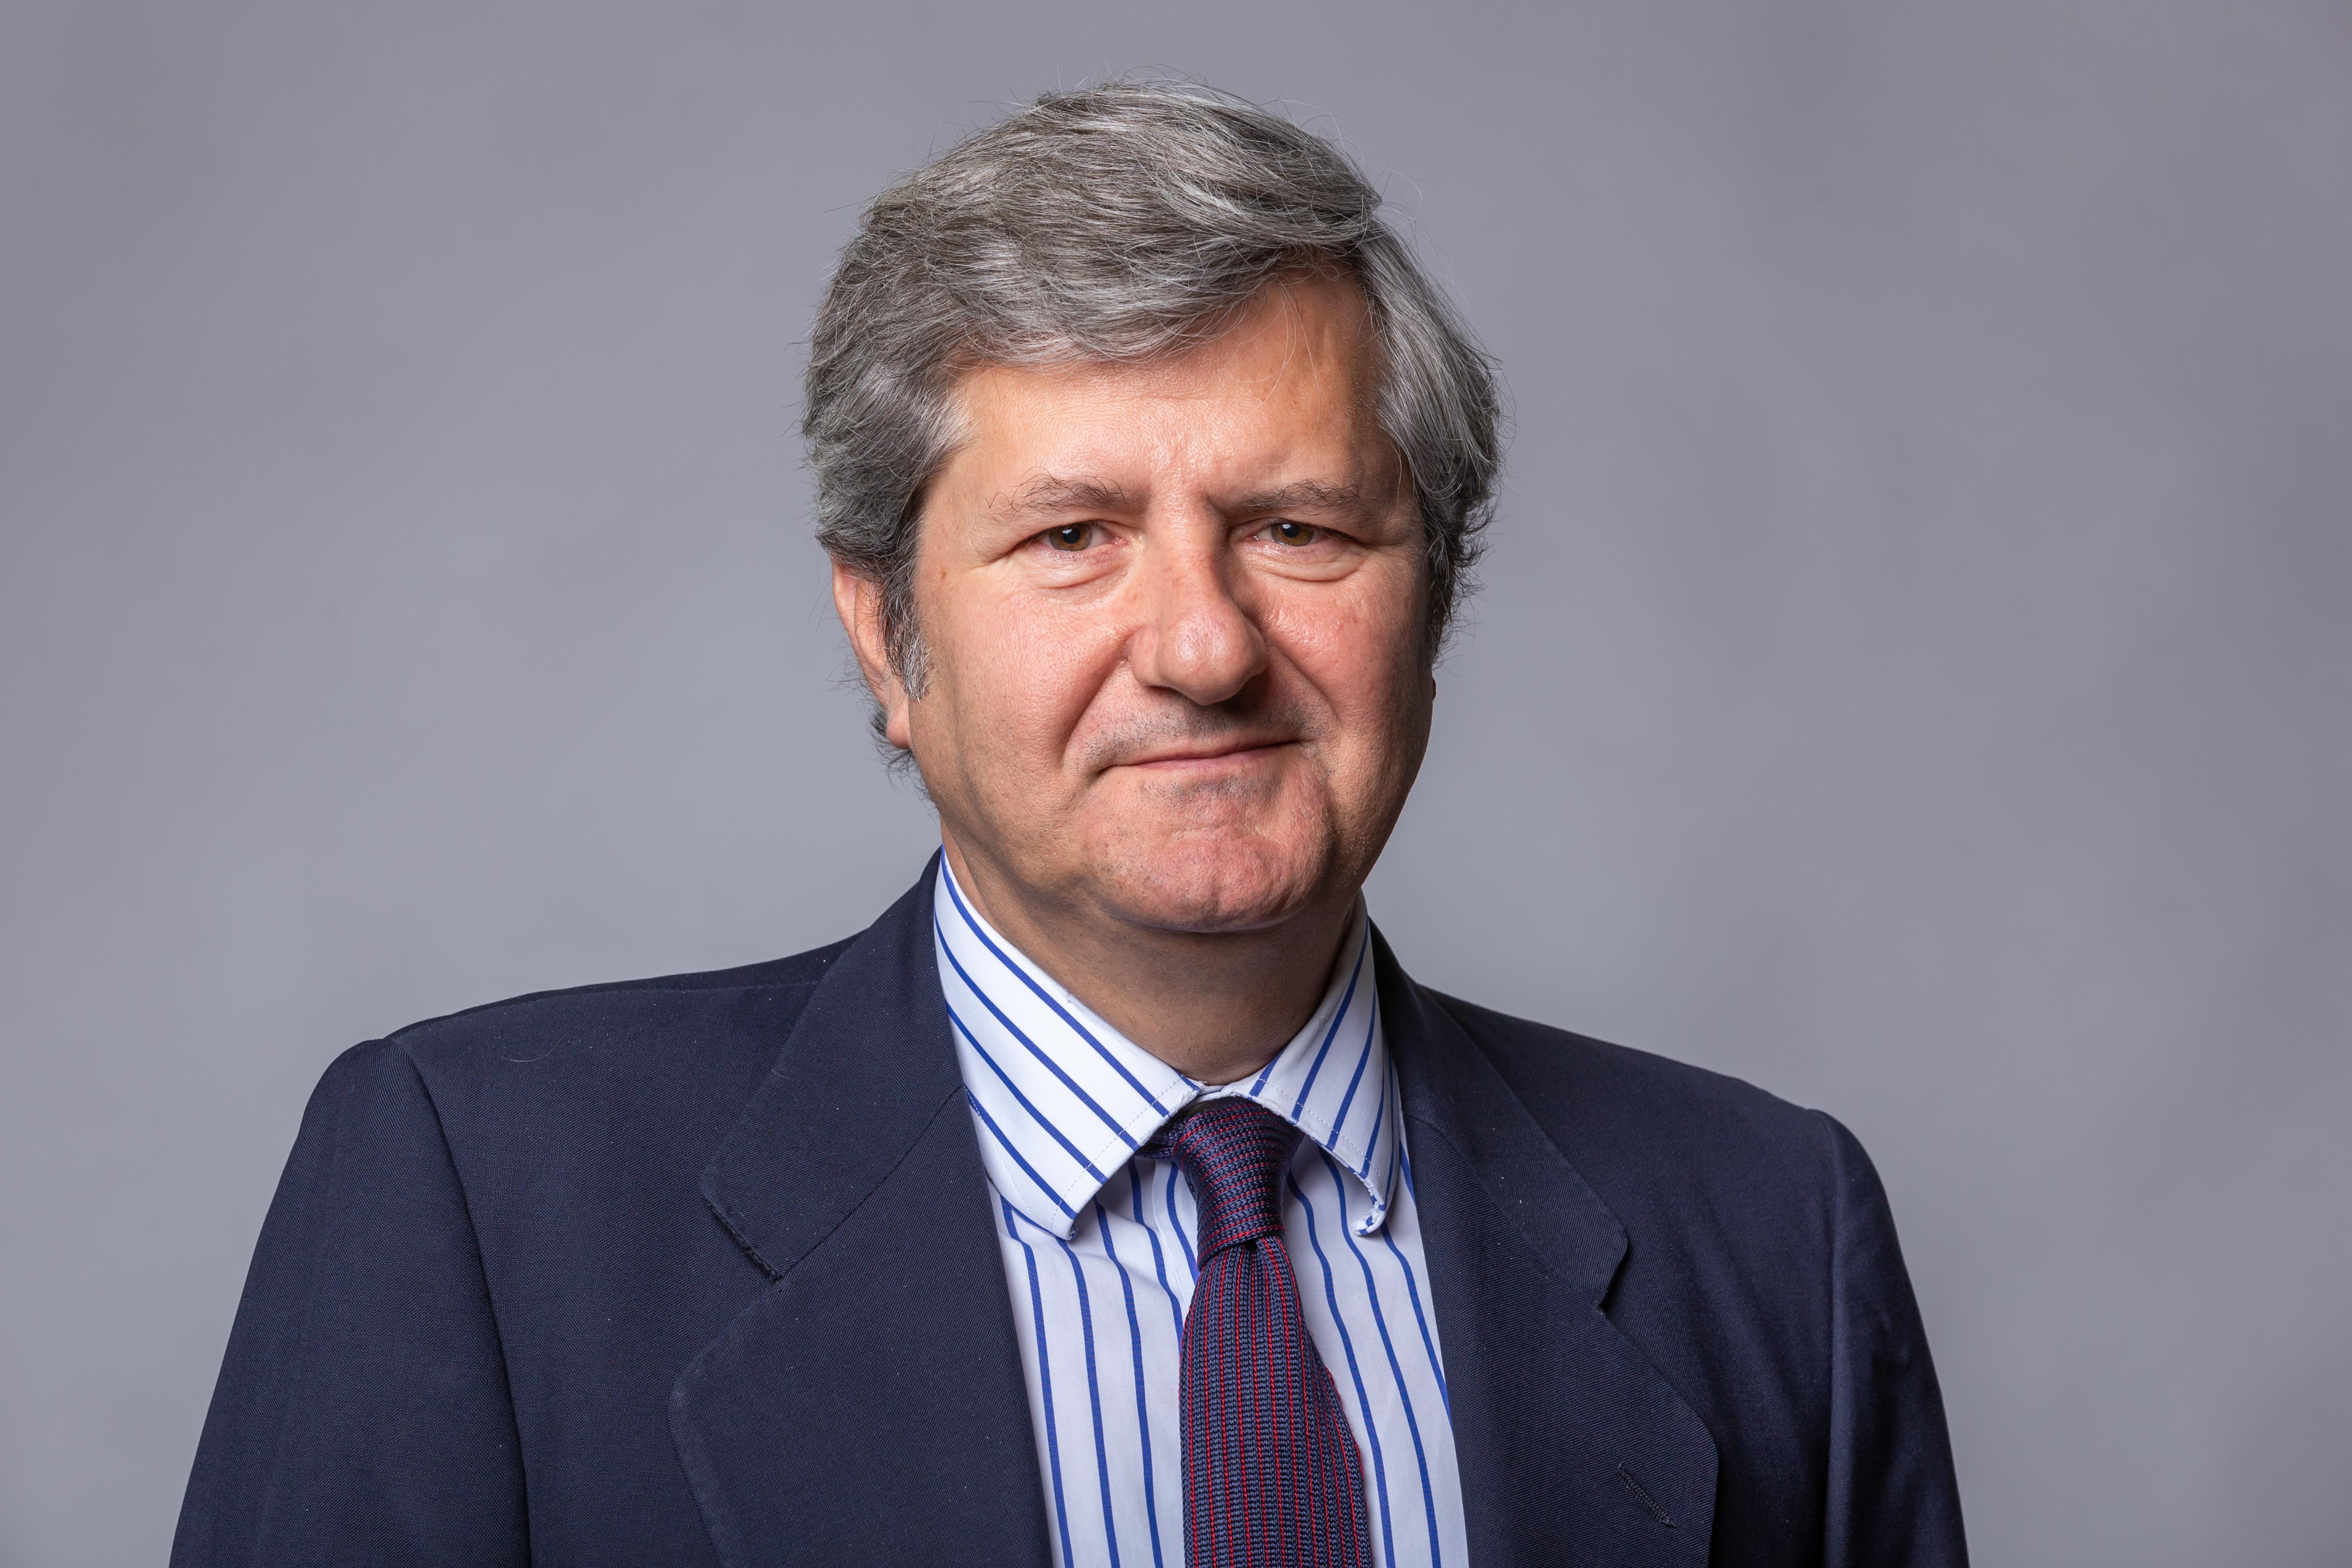 Alberto Muguiro Eulate